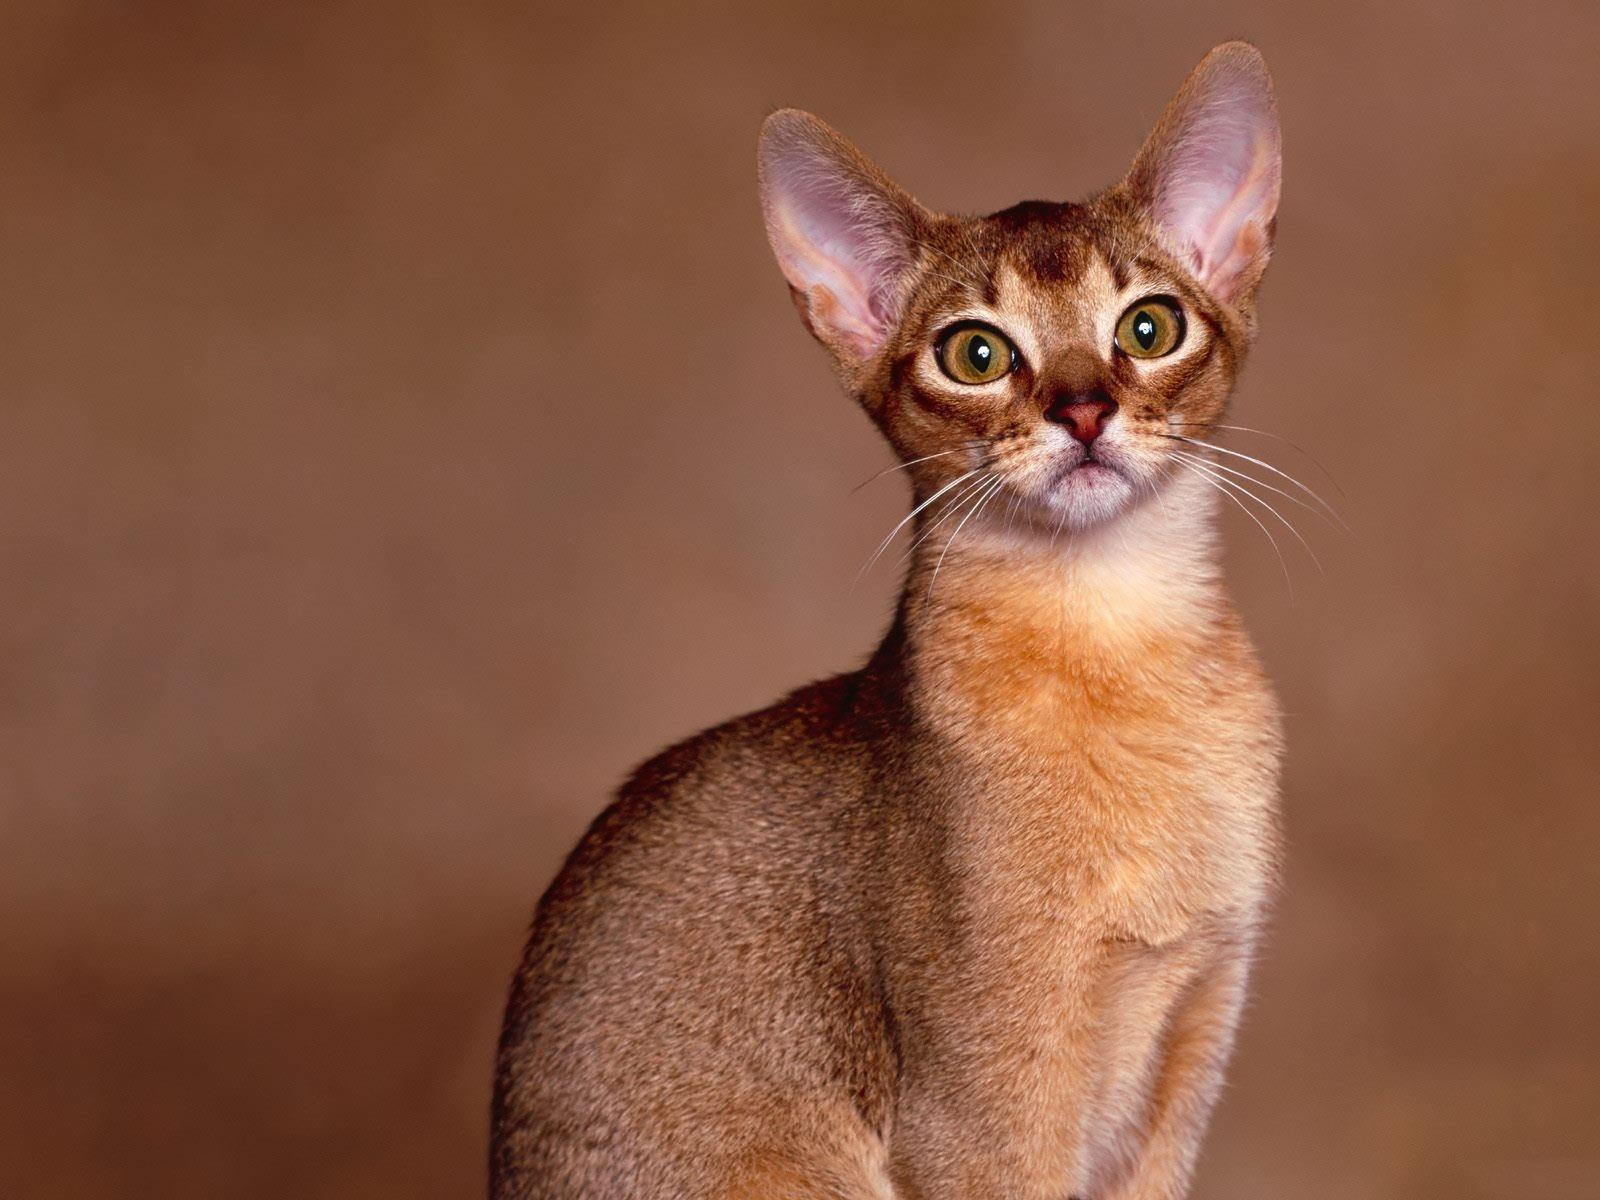 Is abyssinian cat hypoallergenic